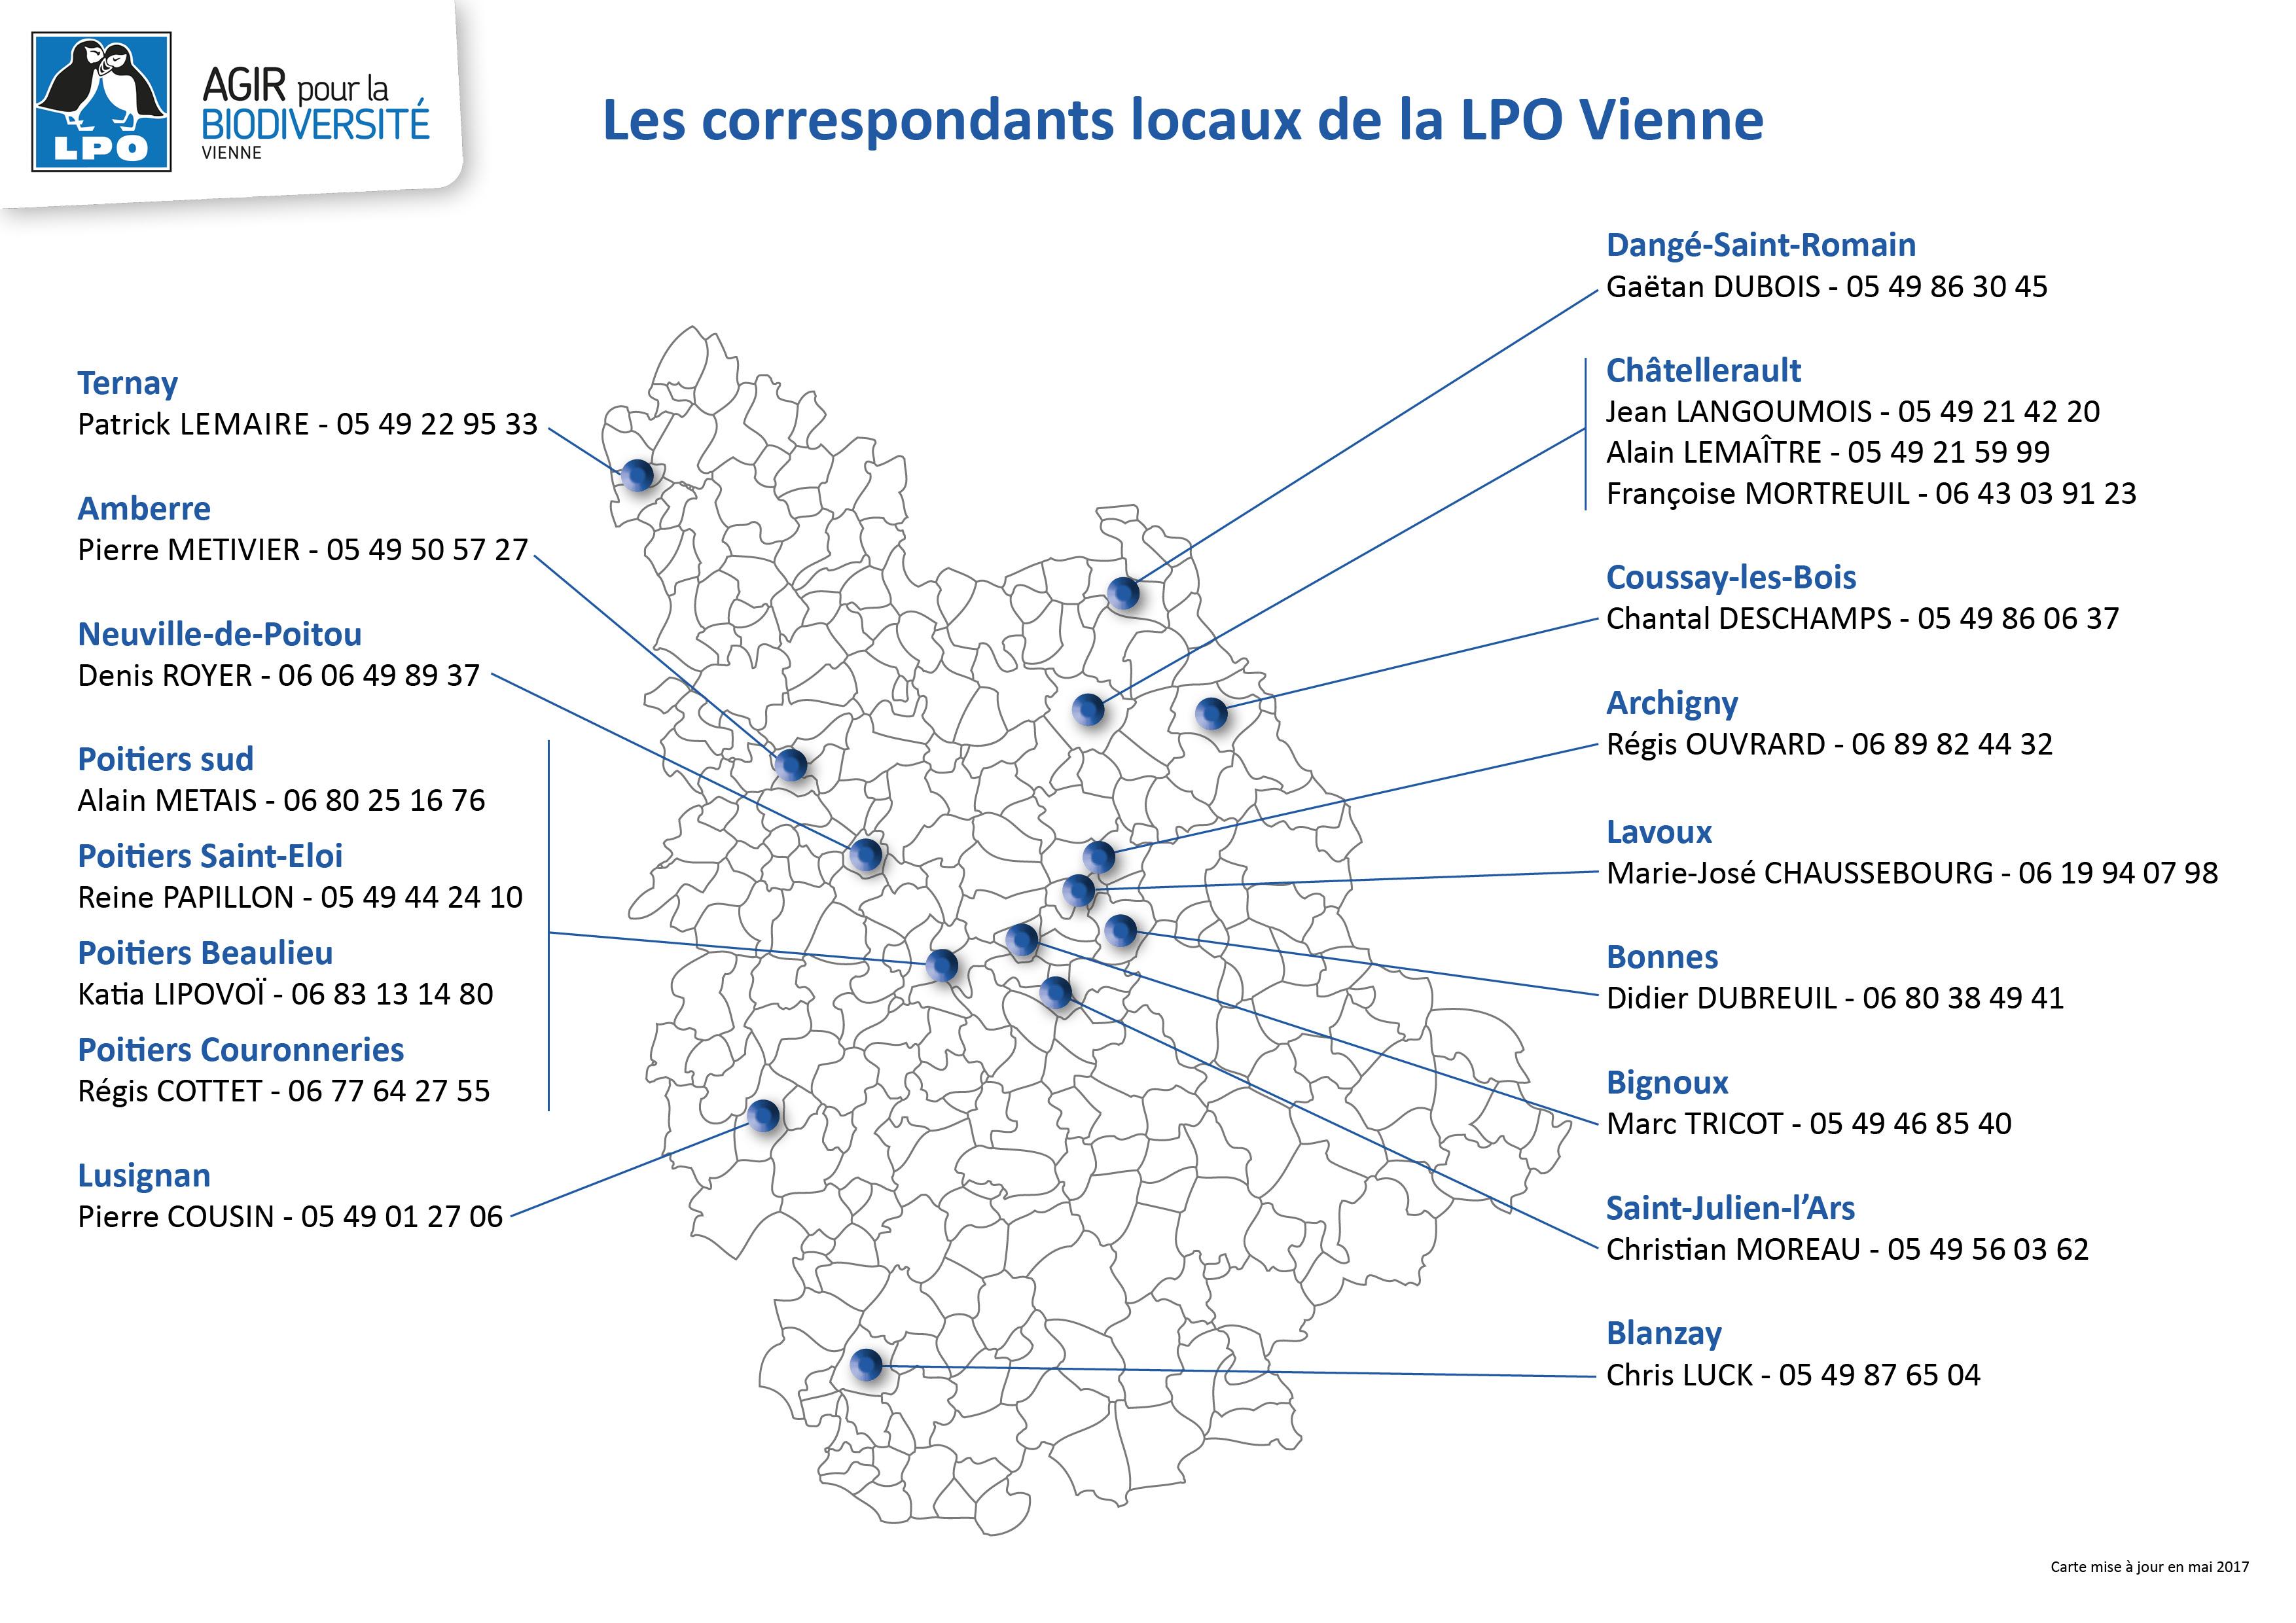 http://files.biolovision.net/vienne.lpo.fr/userfiles/CartedescorrespondantslocauxLPOVienneMAJmai2017.jpg